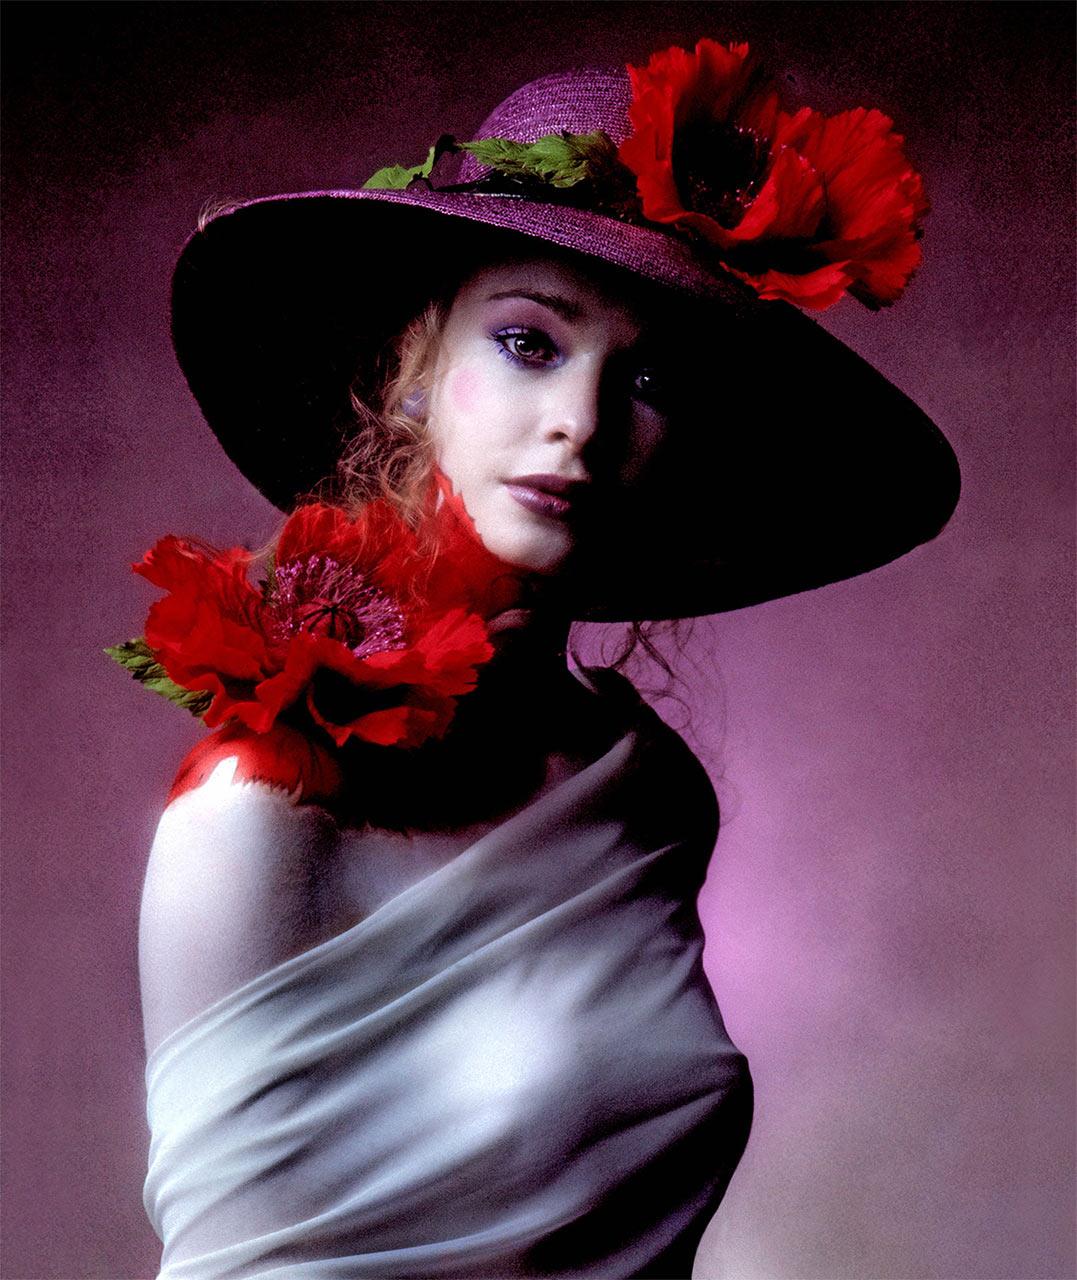 Clive_Arrowsmith-Maudi-flower©